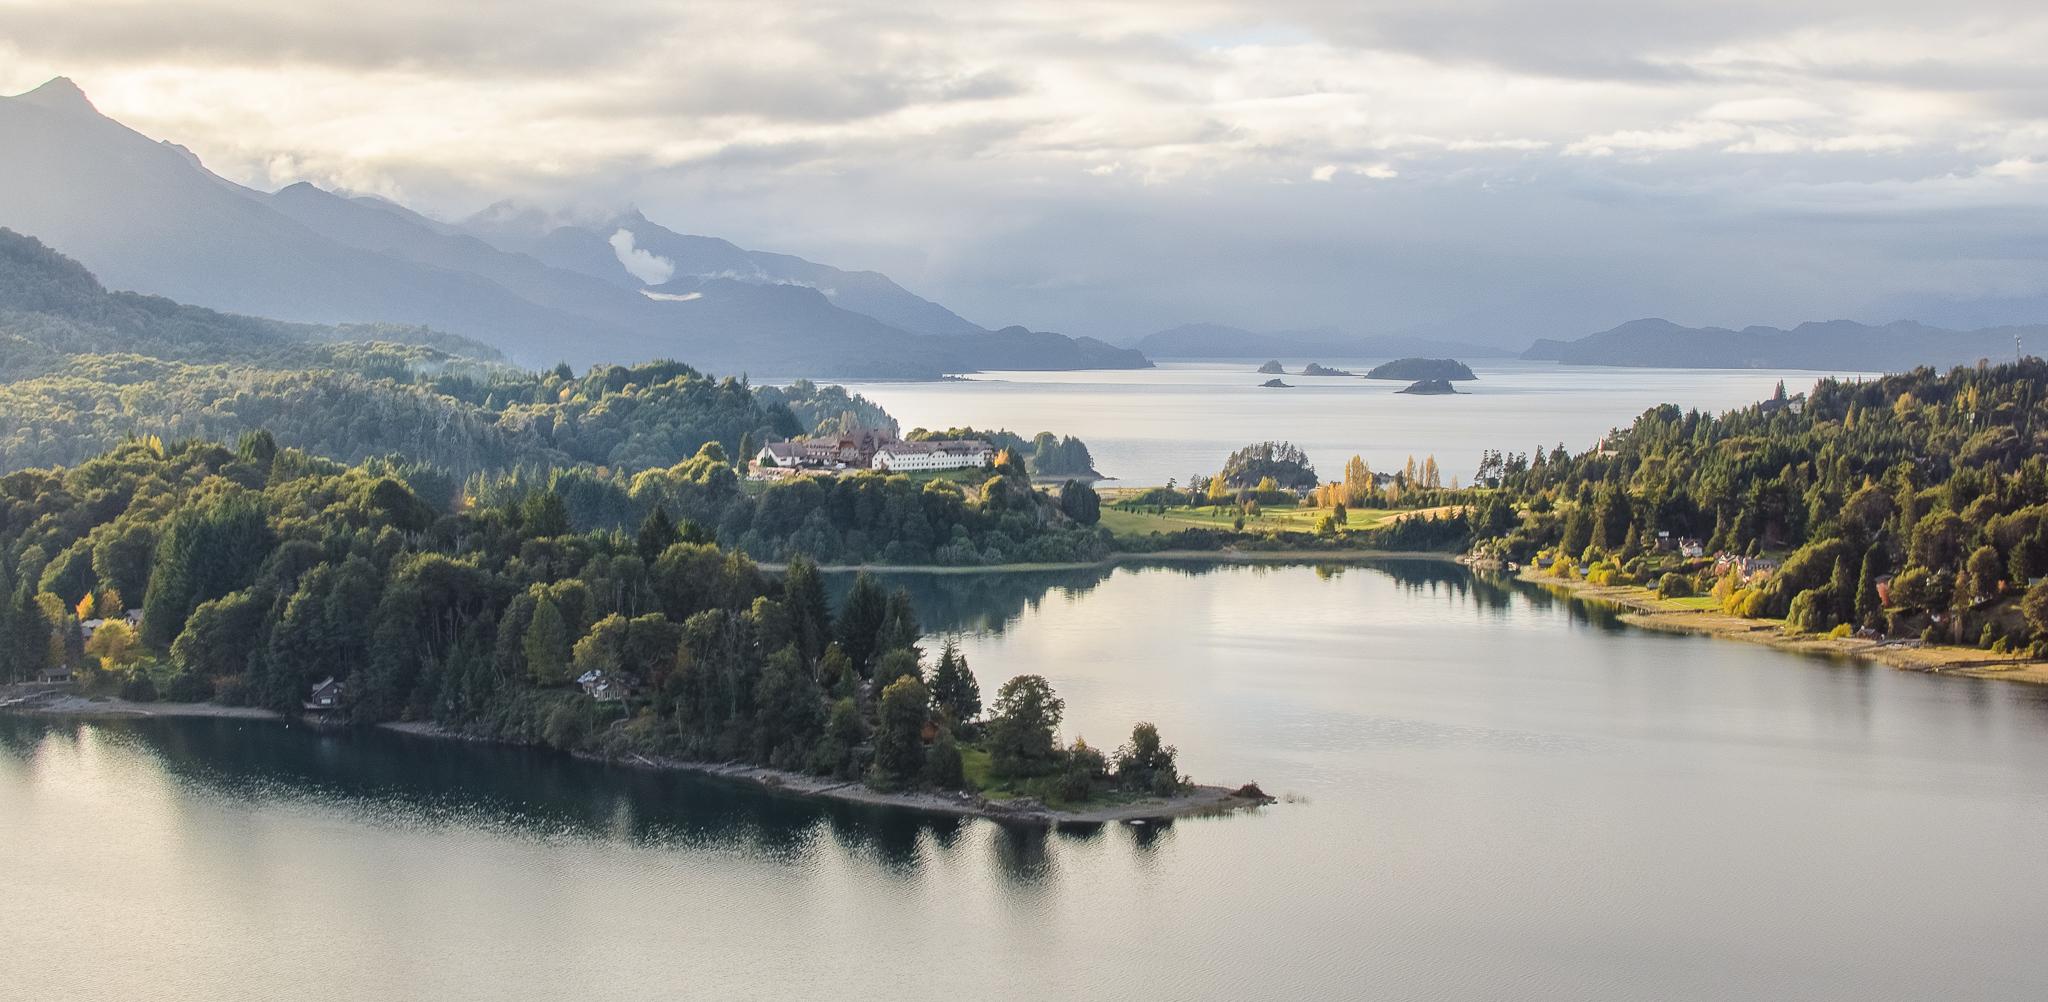 Punto panoramico Bariloche, Argentina